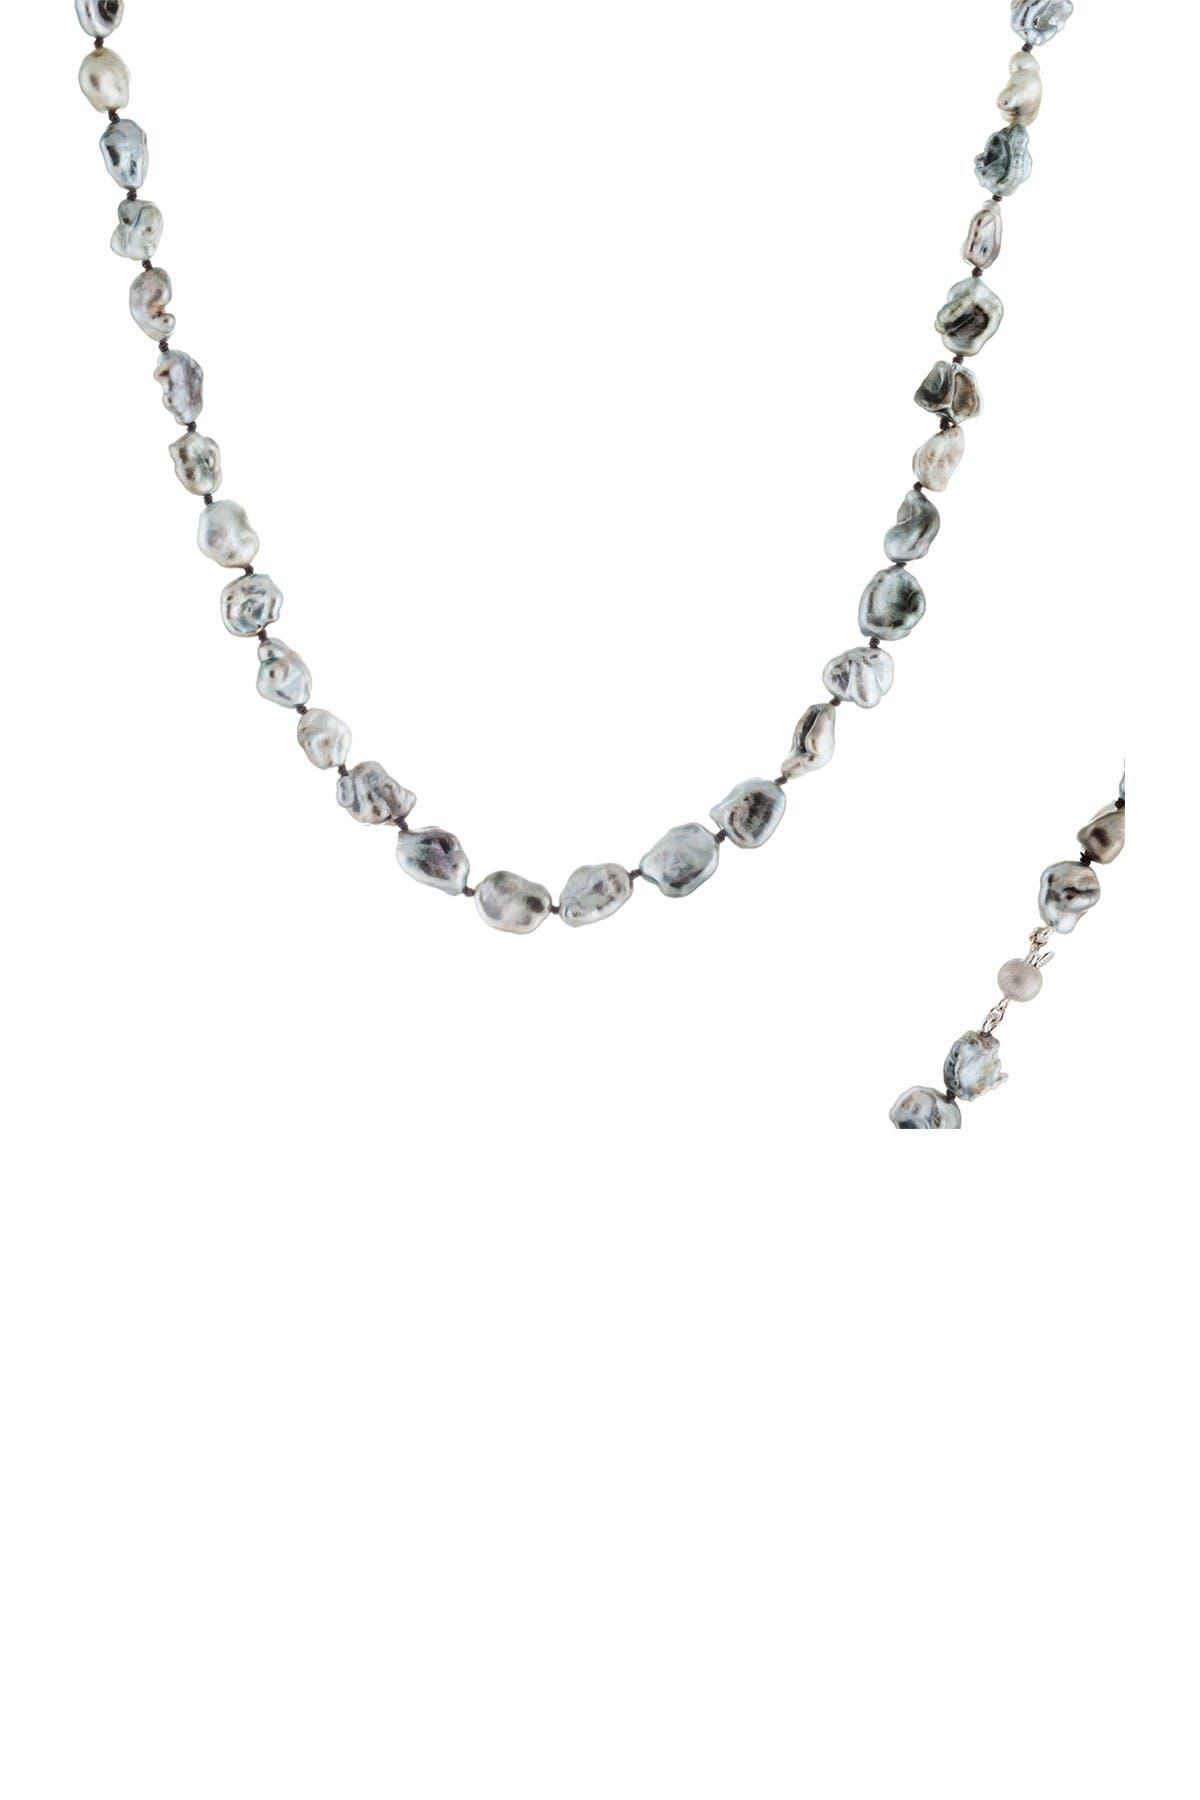 Image of Splendid Pearls Tahitian Pearl Necklace